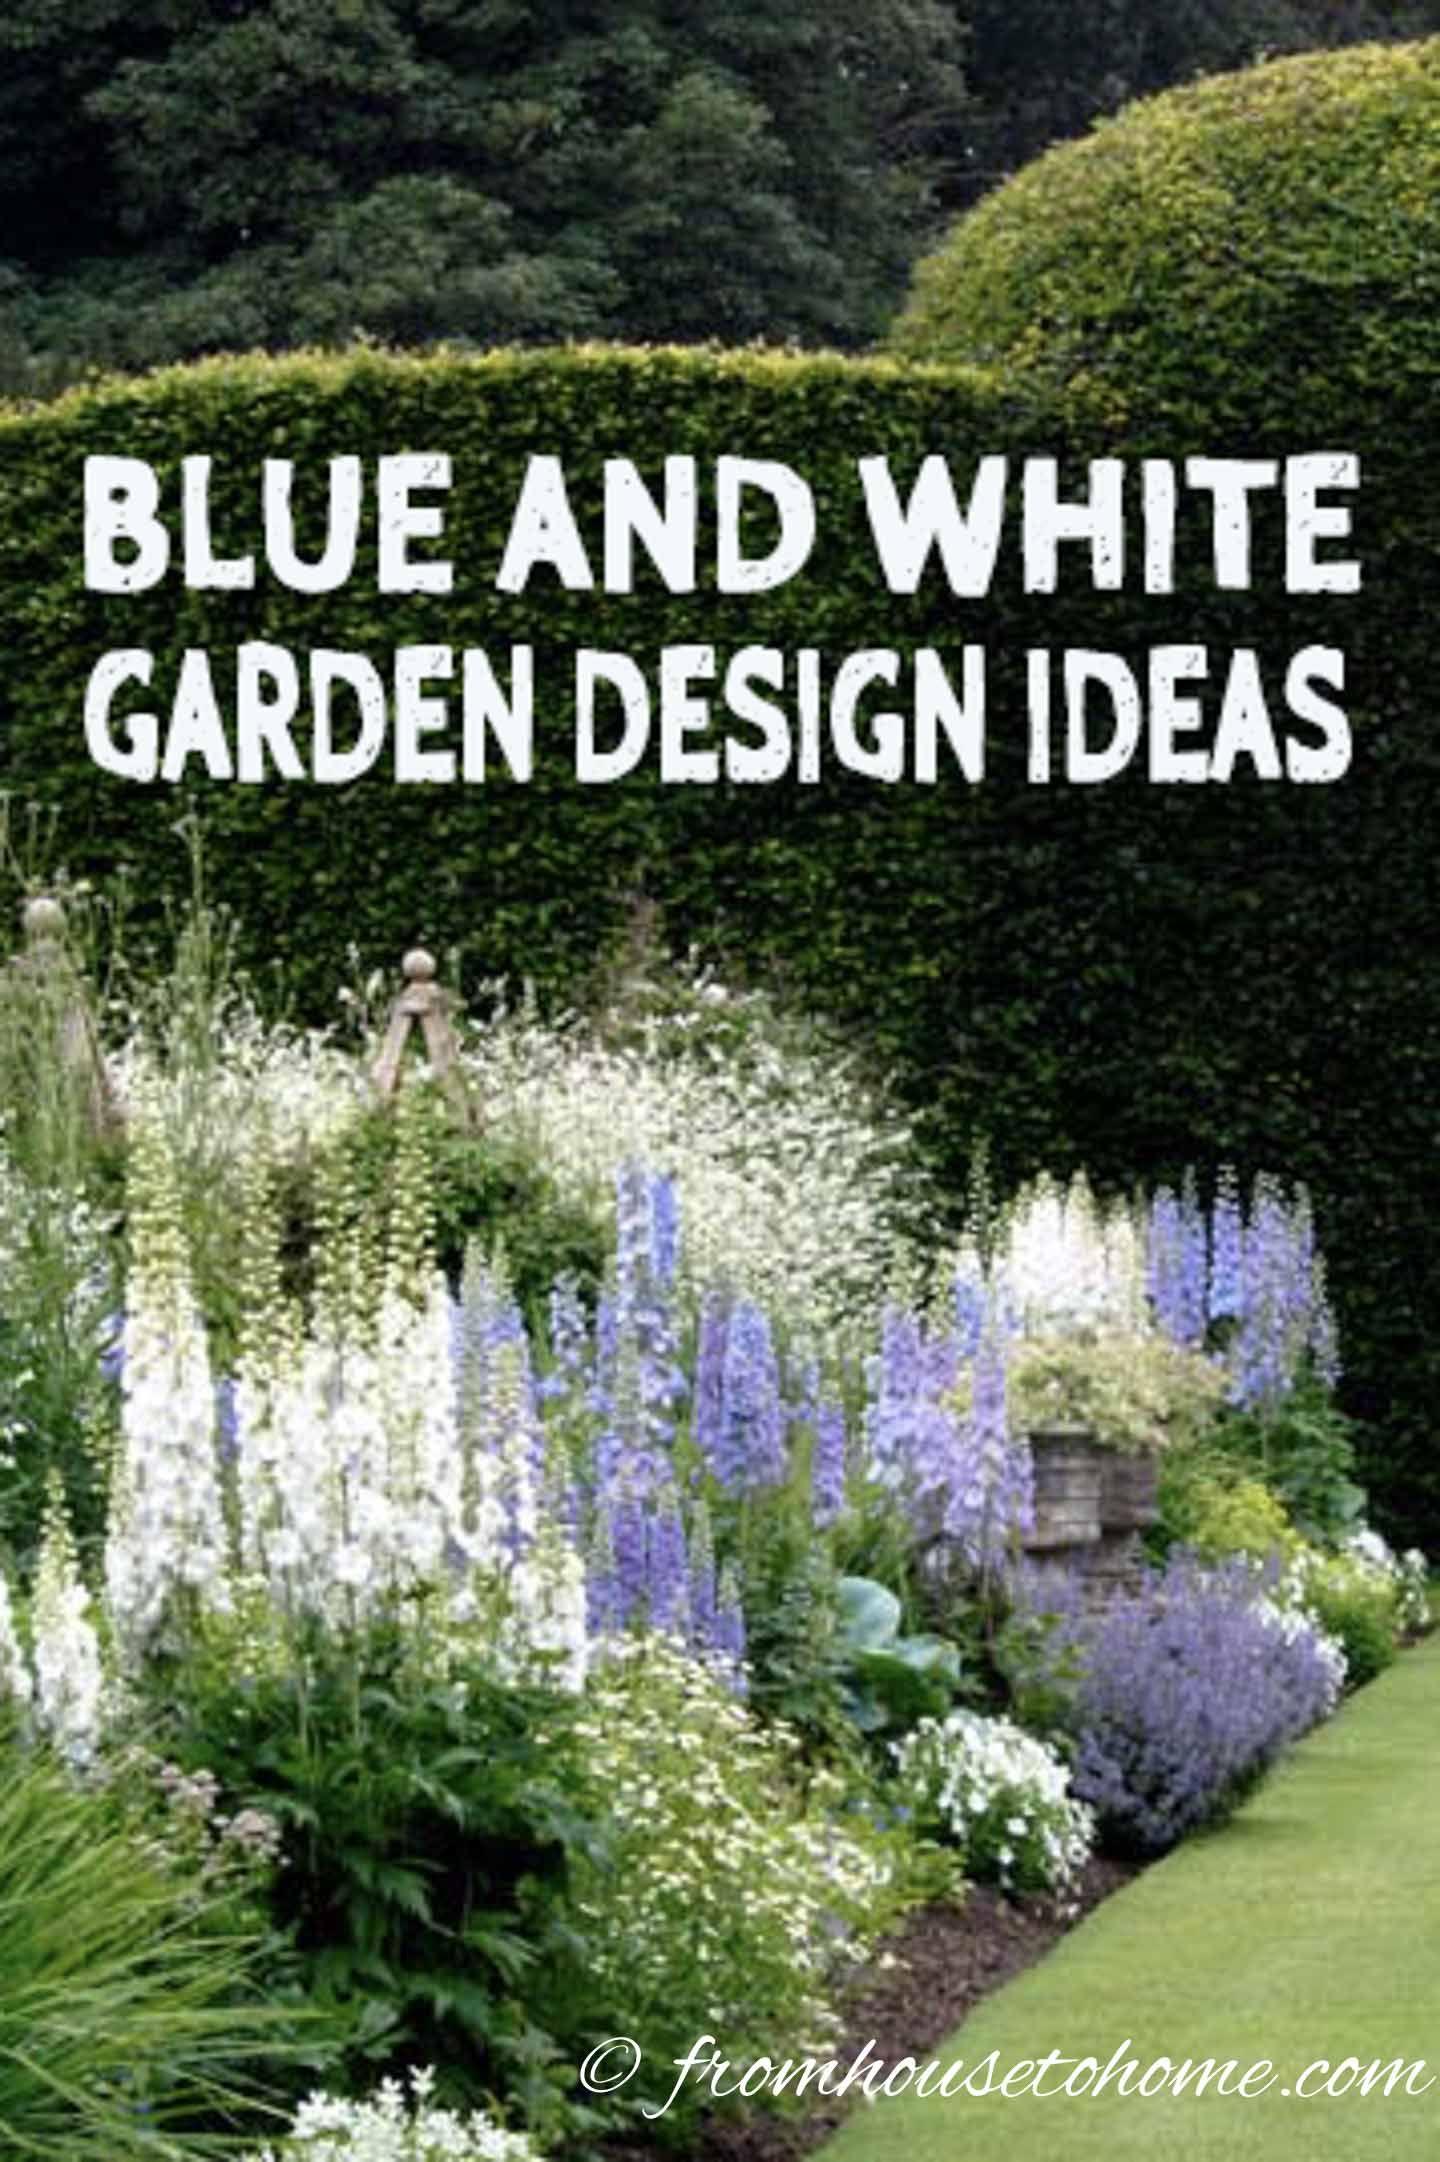 Blue & White Garden Design Ideas